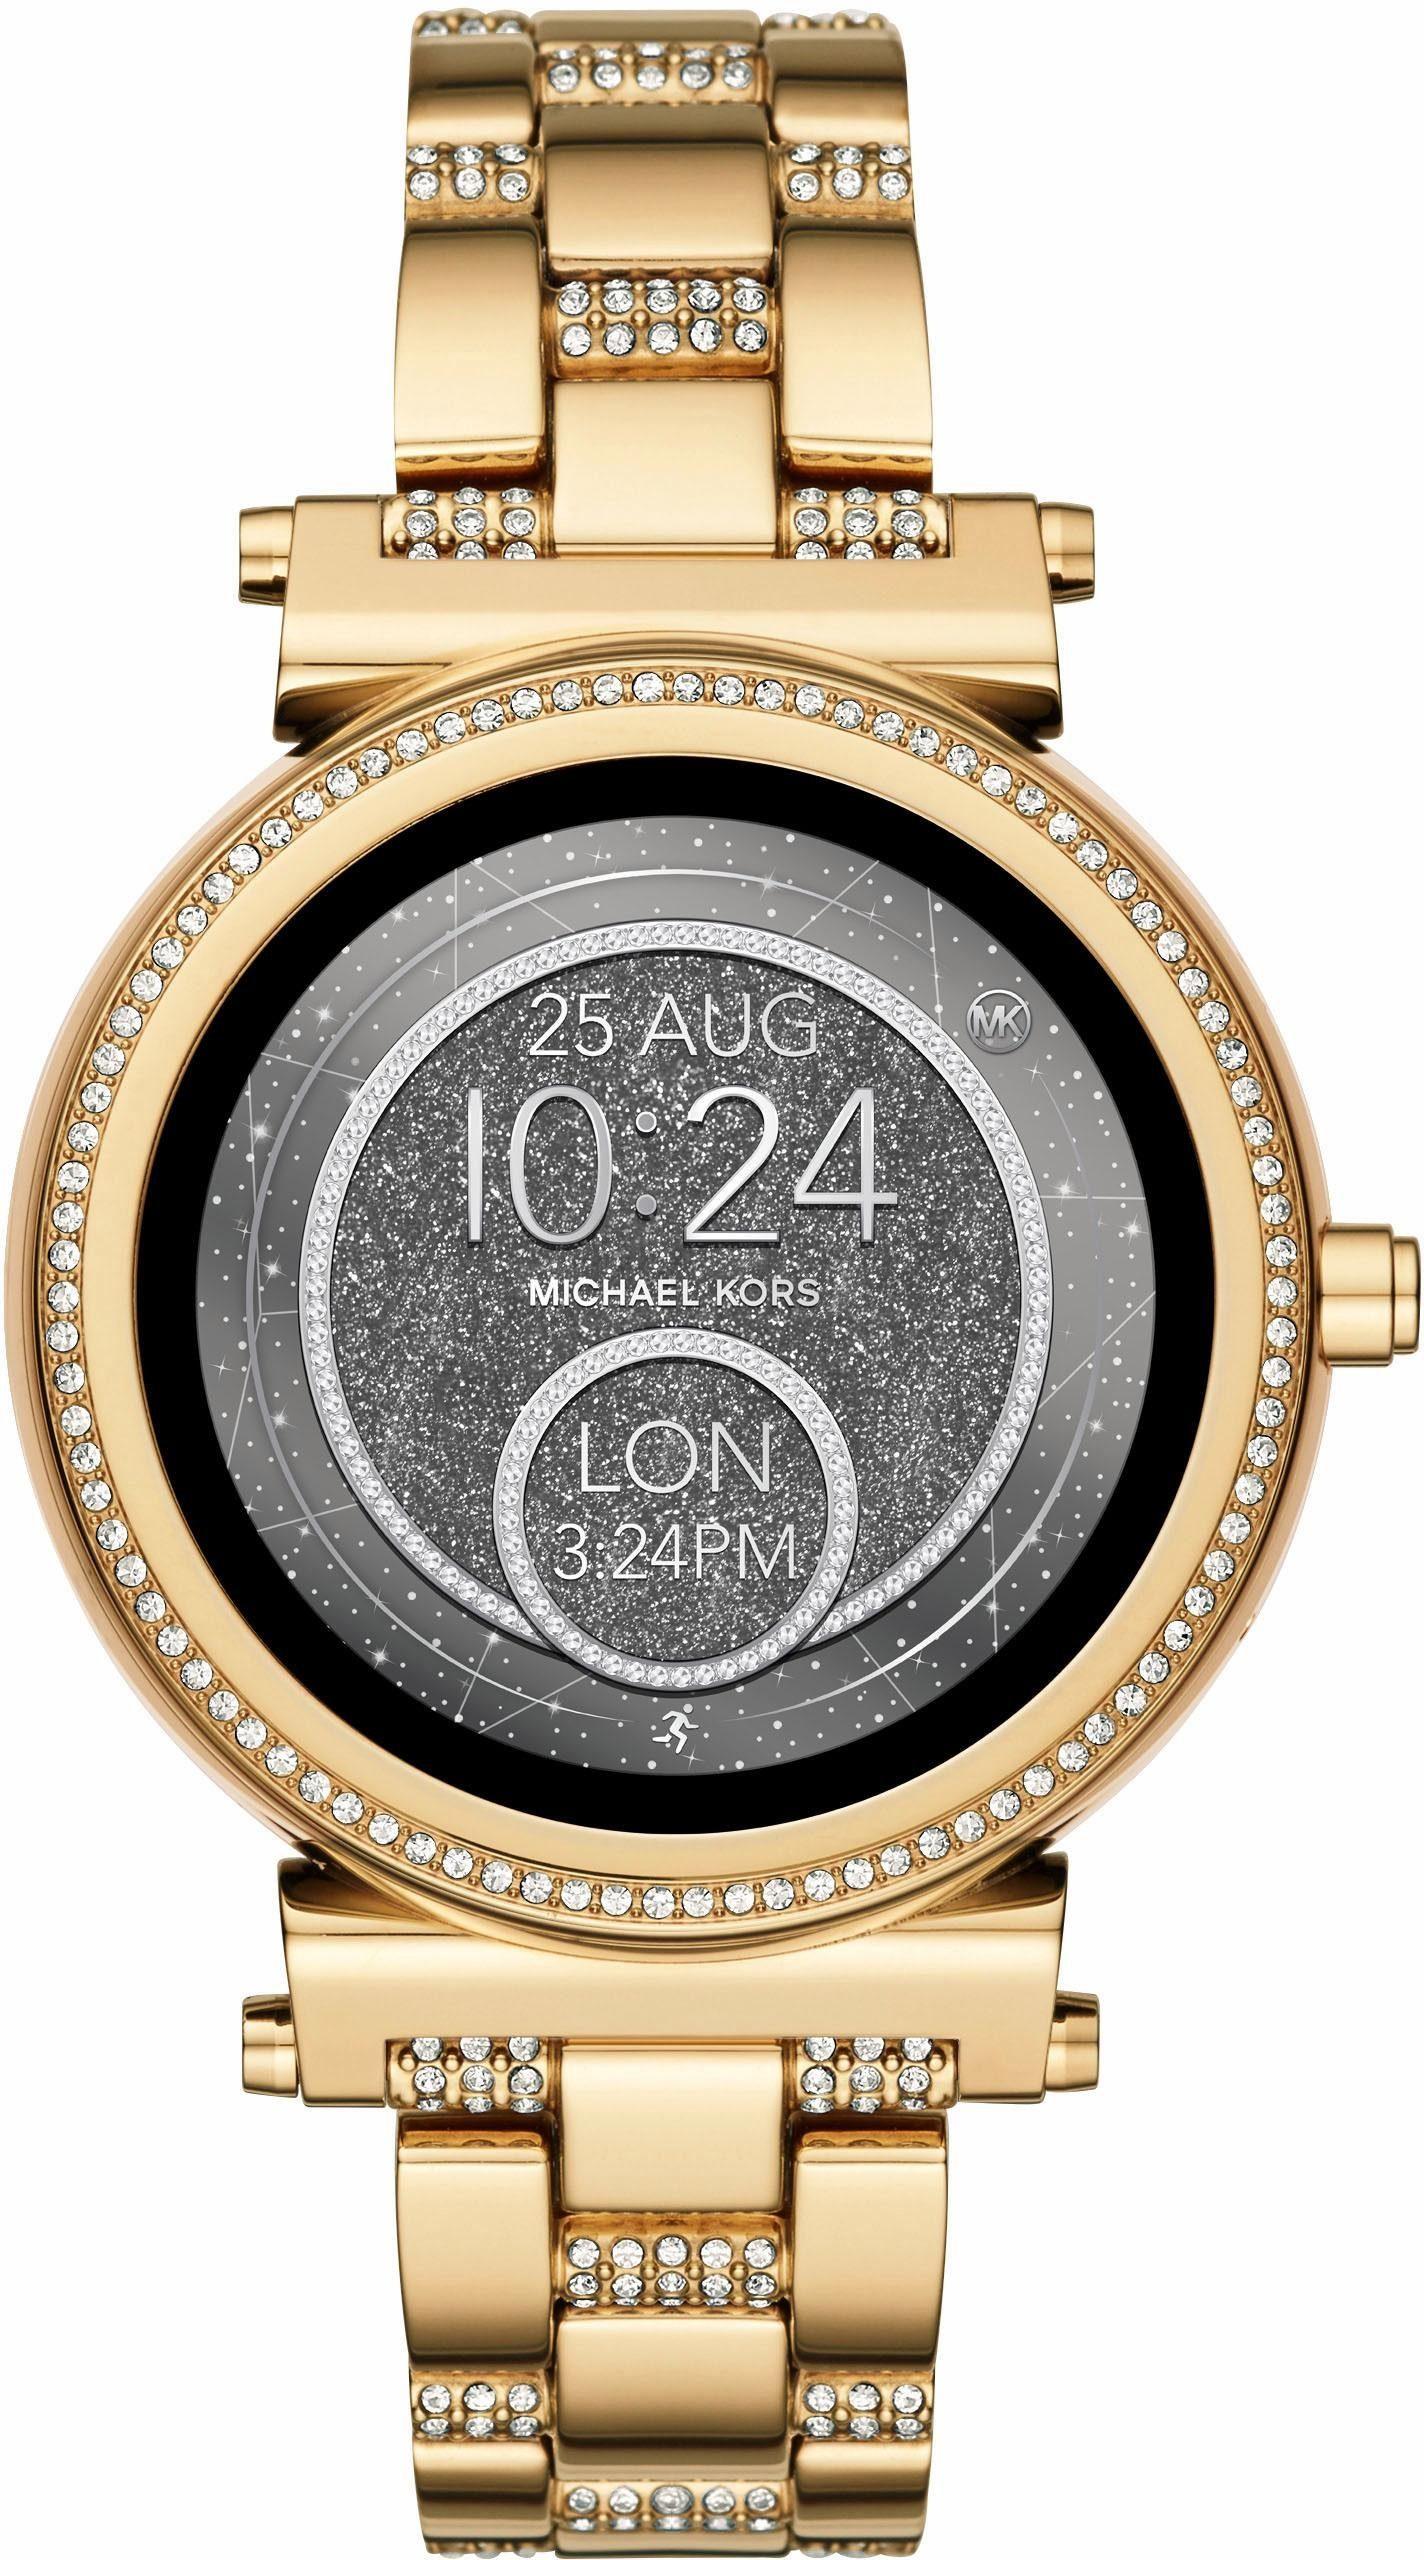 MICHAEL KORS ACCESS SOFIE, MKT5023 Smartwatch (Android Wear, inkl. Dornschließe für Wechselband)